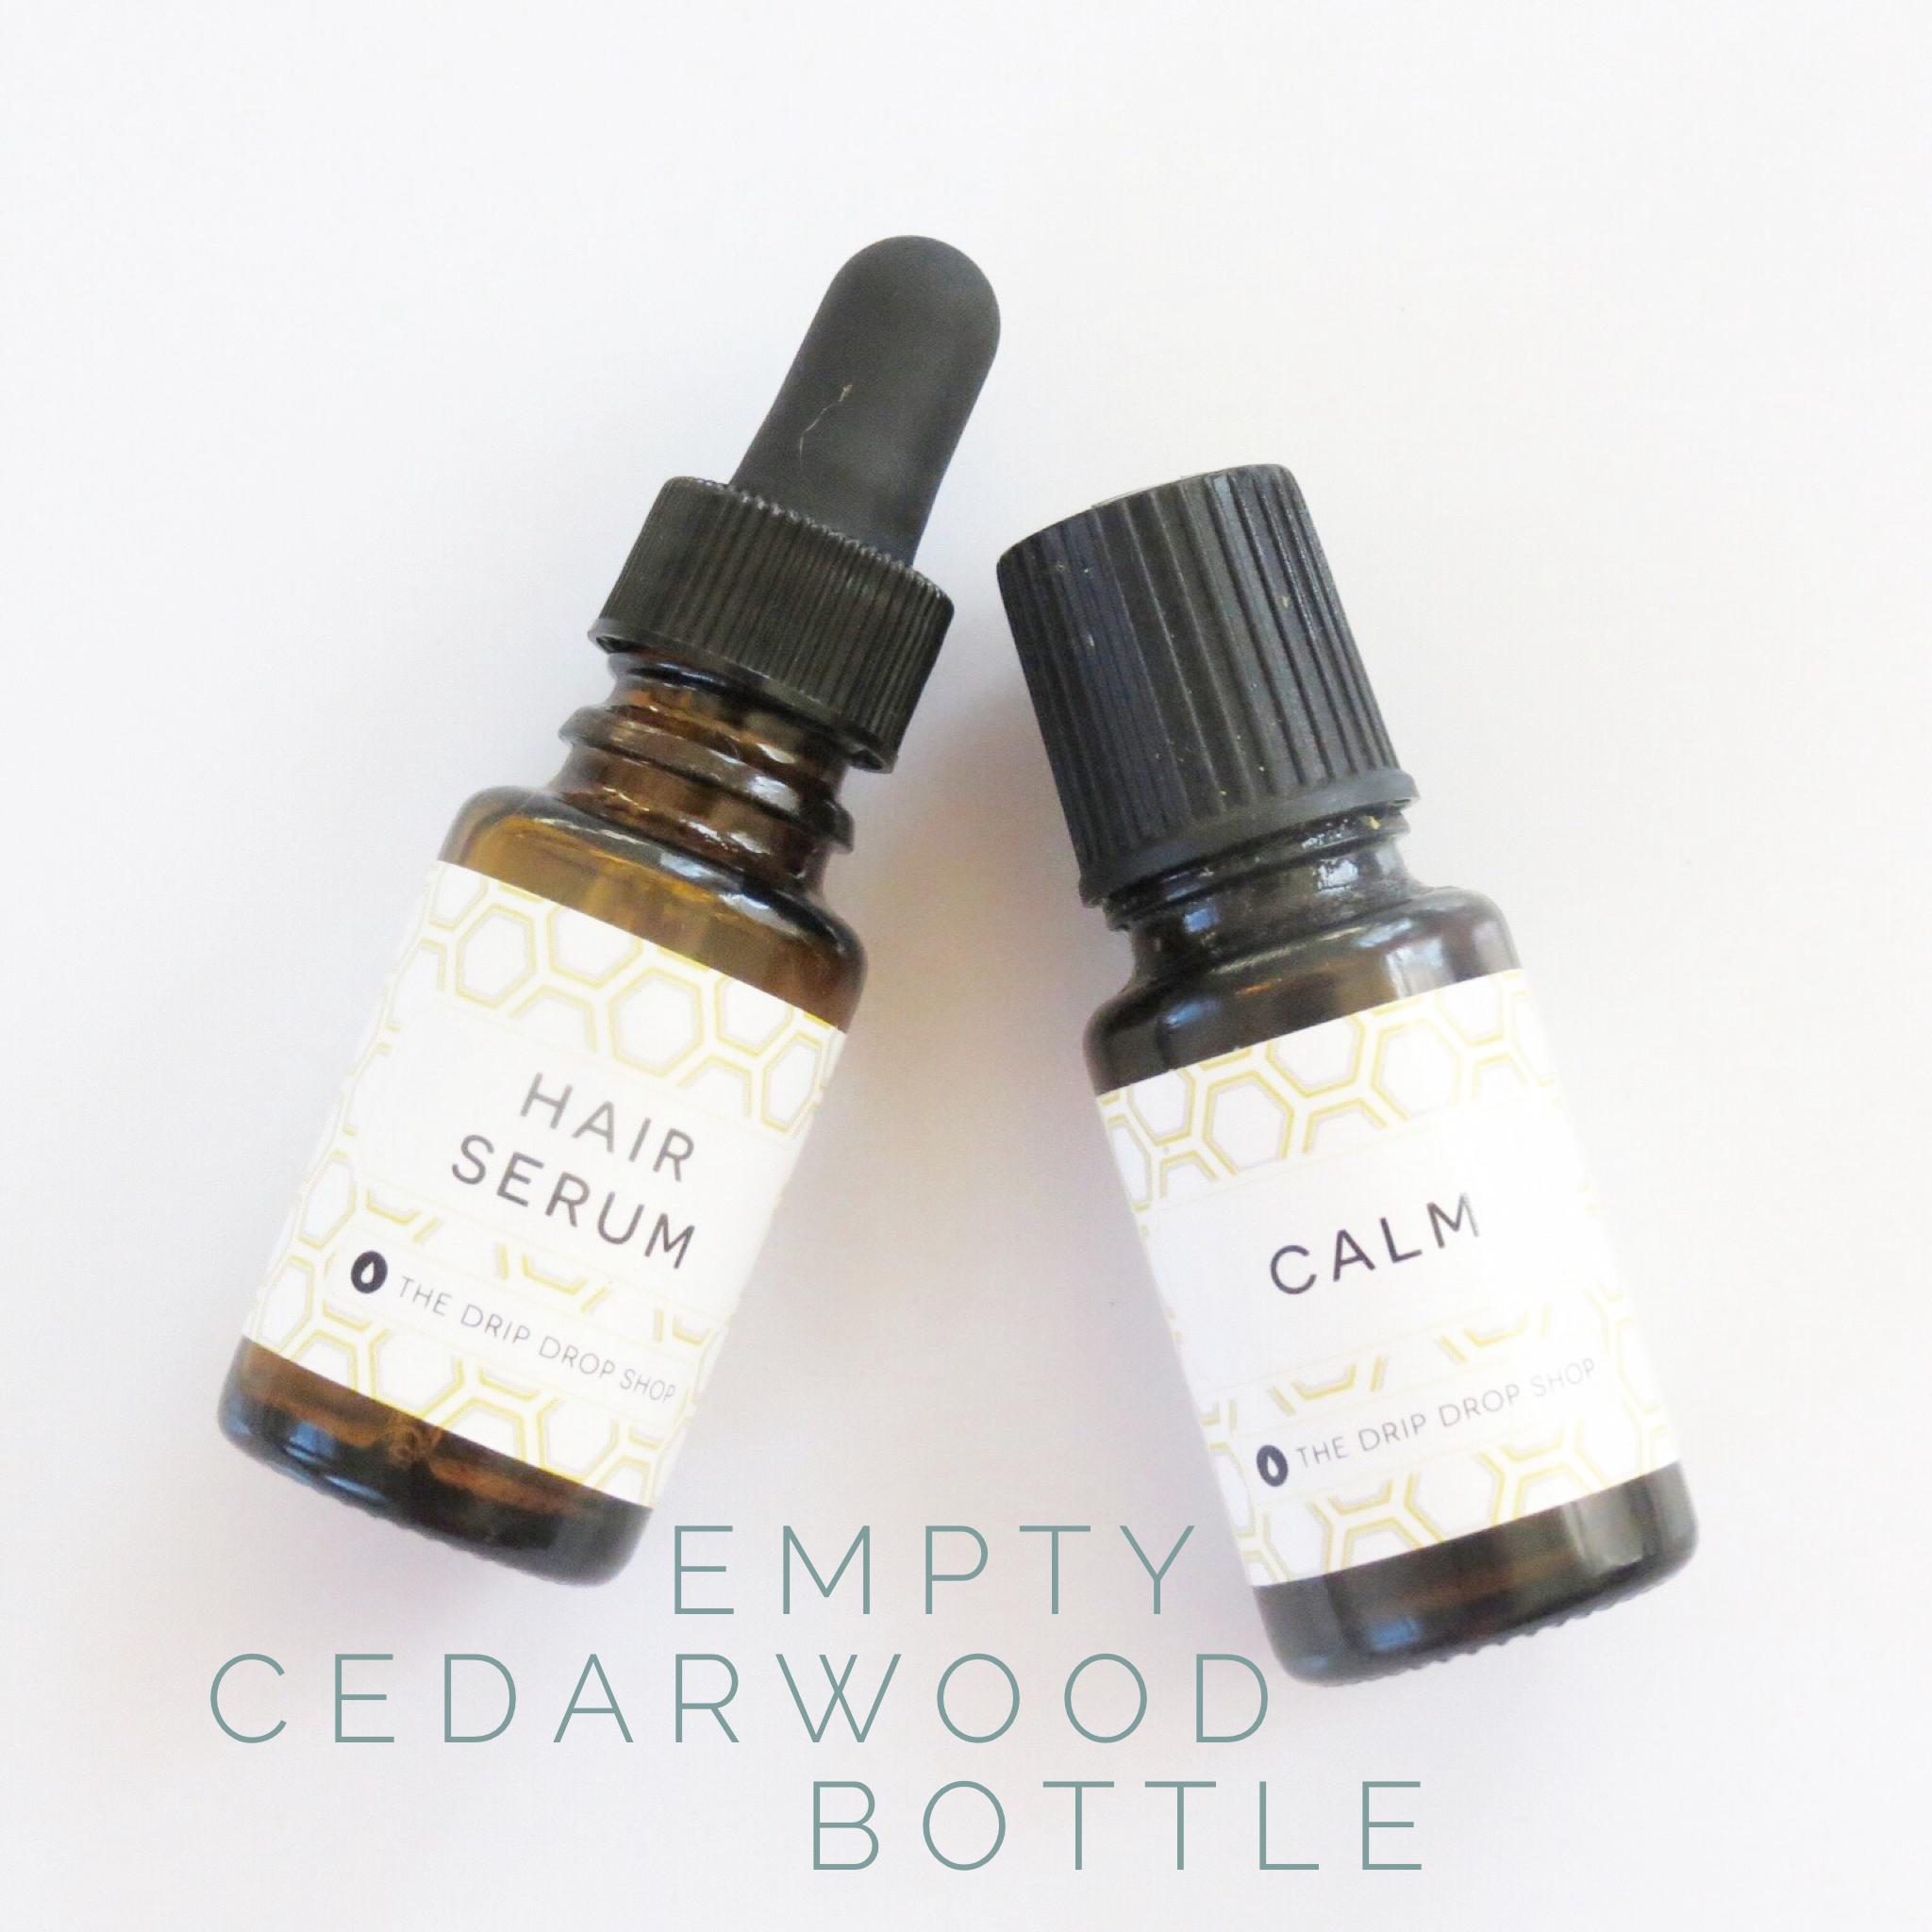 Cedarwood bottle uses